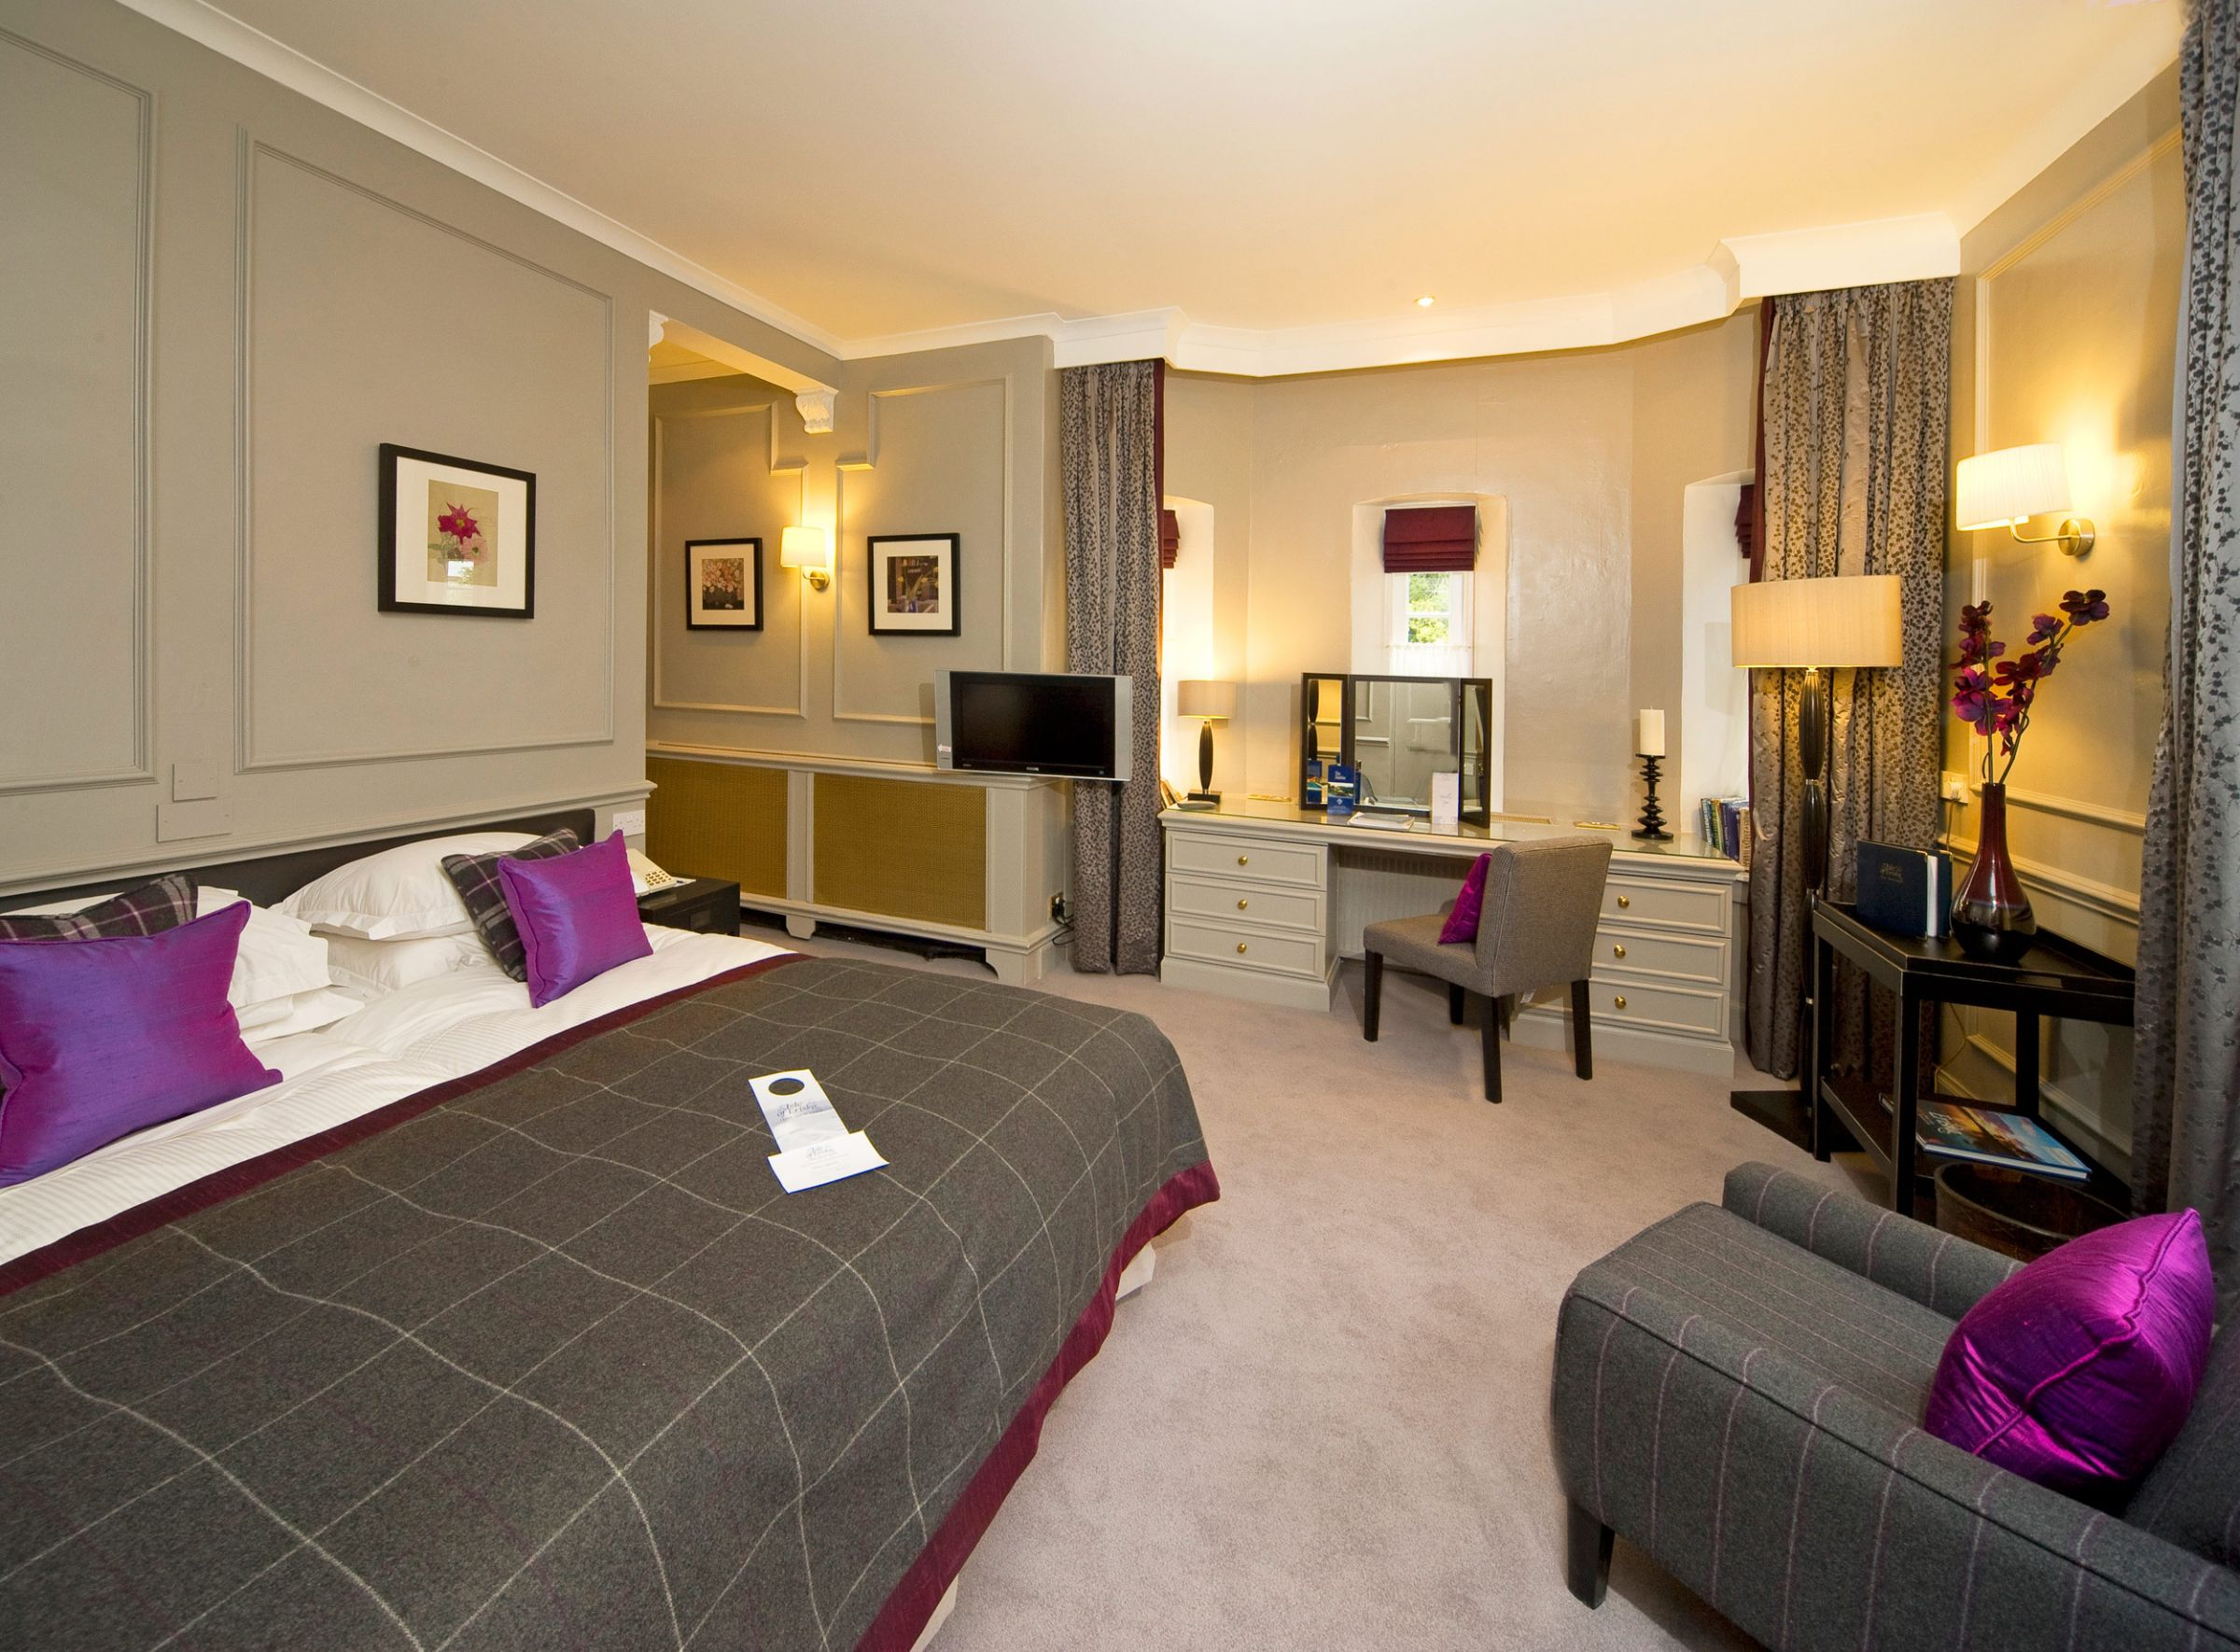 The-Isle-of-Eriska-Hotel-bedroom